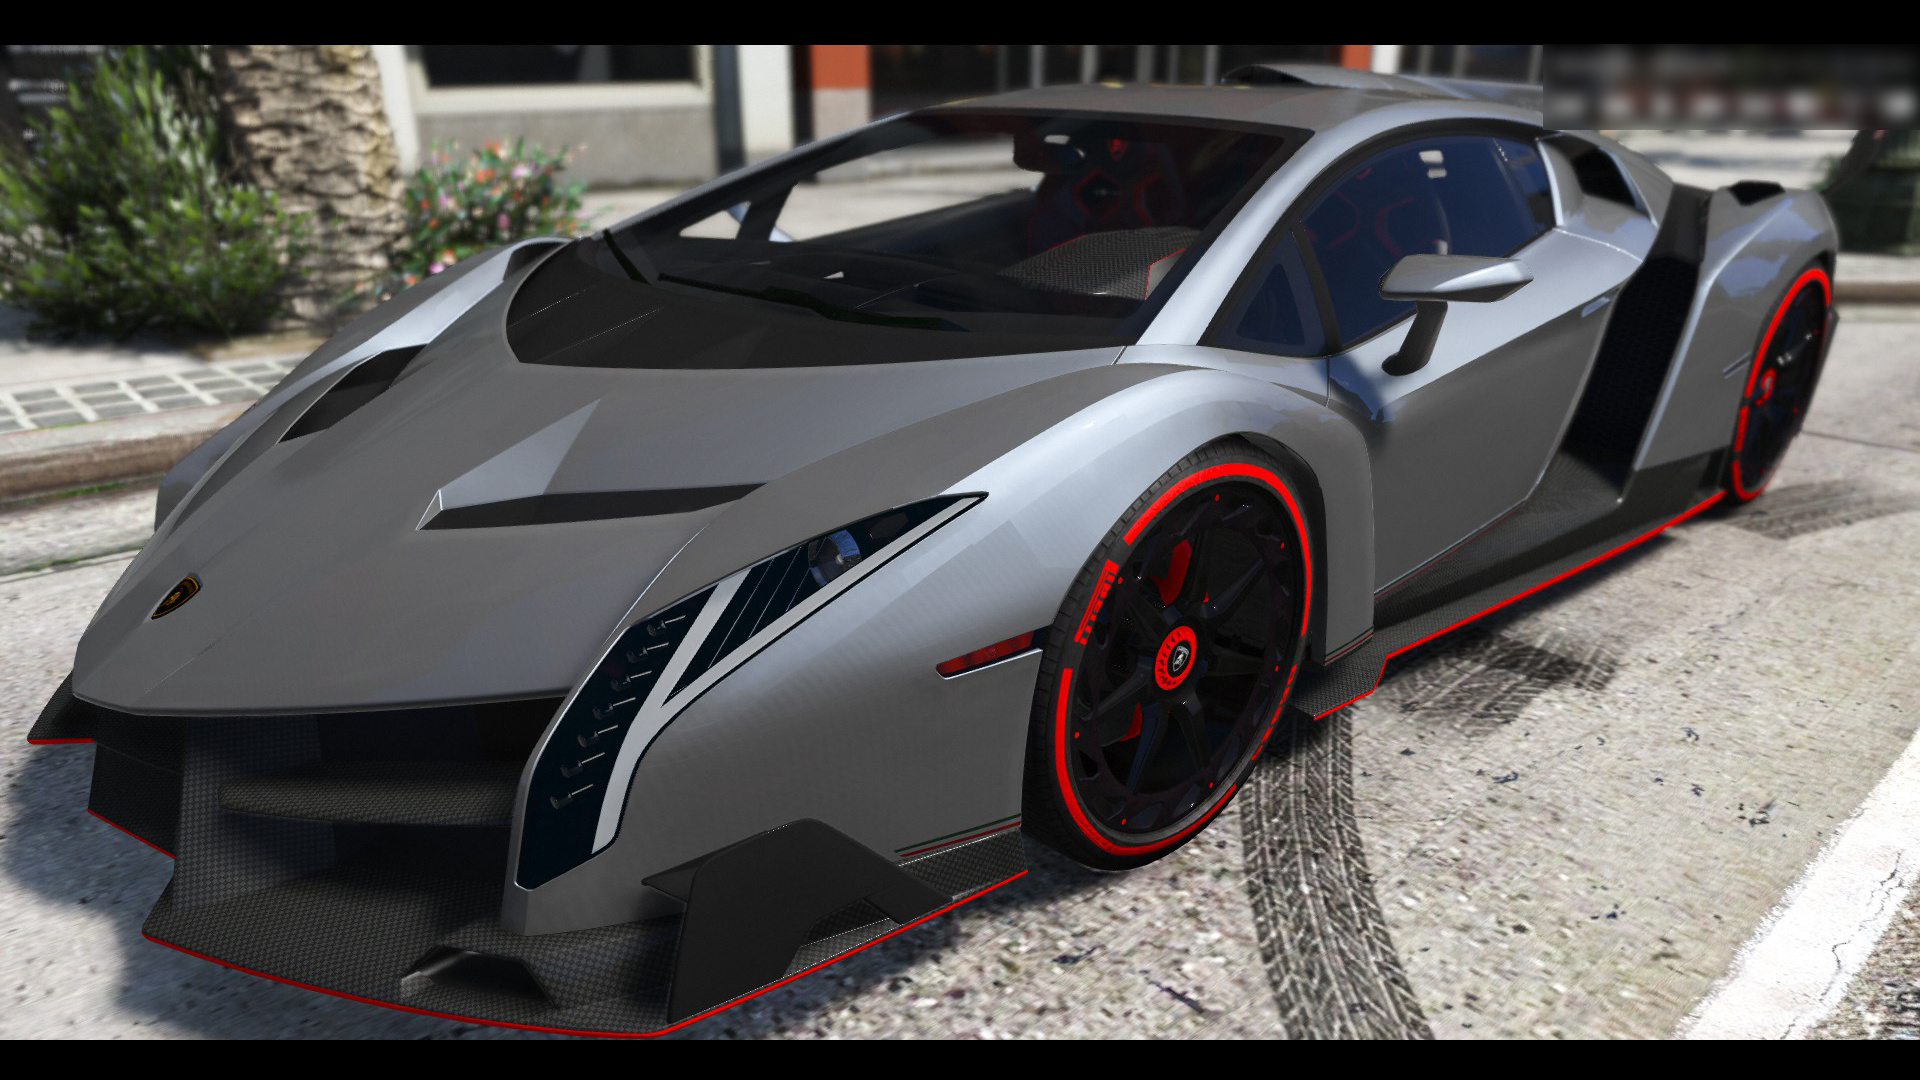 Pegassi Zentorno Wallpaper Car 2013 Lamborghini Veneno Hq Add On Dials Gta5 Mods Com